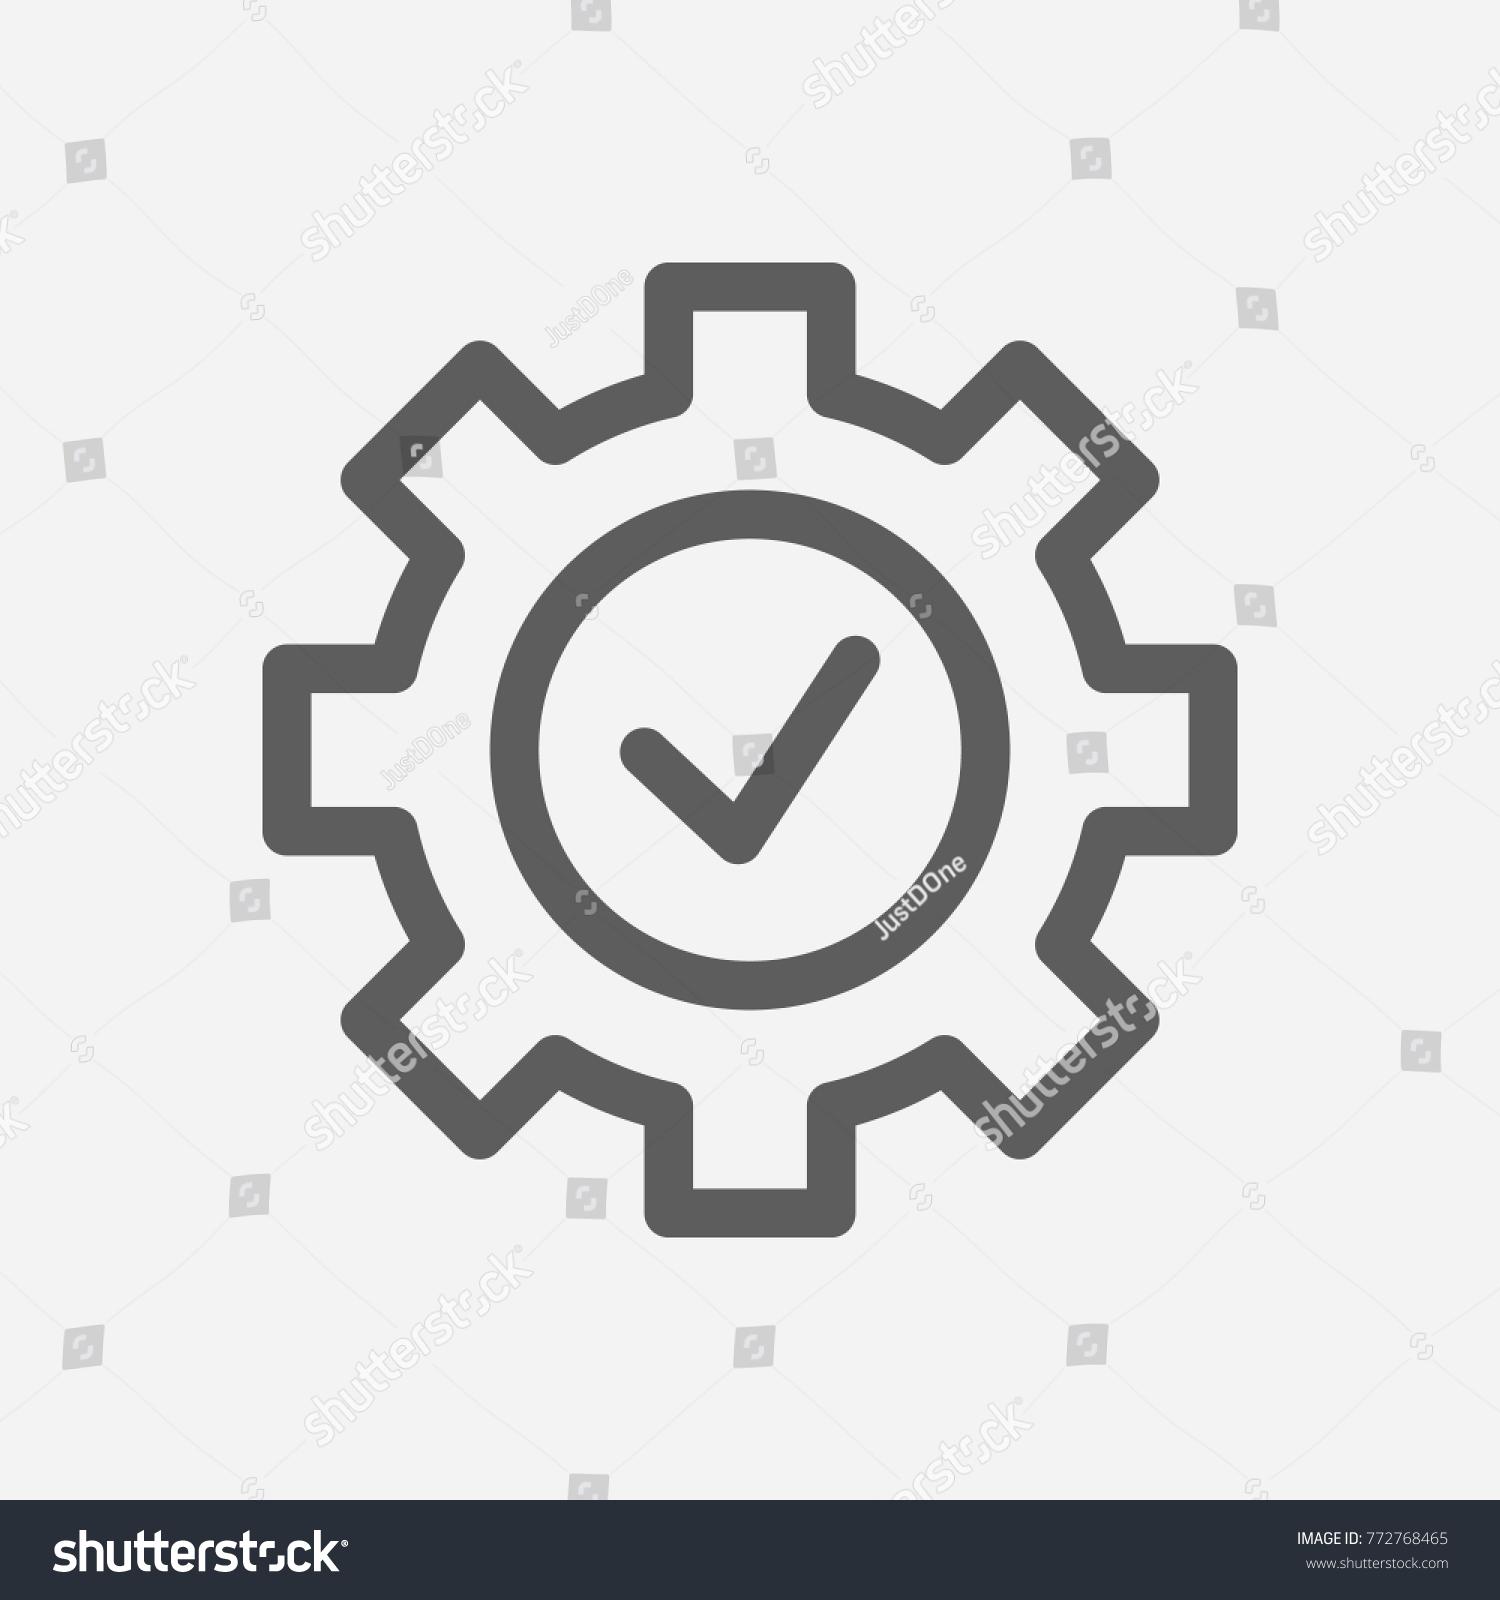 Core values expertise icon gear check stock vector 772768465 core values expertise icon gear check line symbol isolated vector illustration on company values buycottarizona